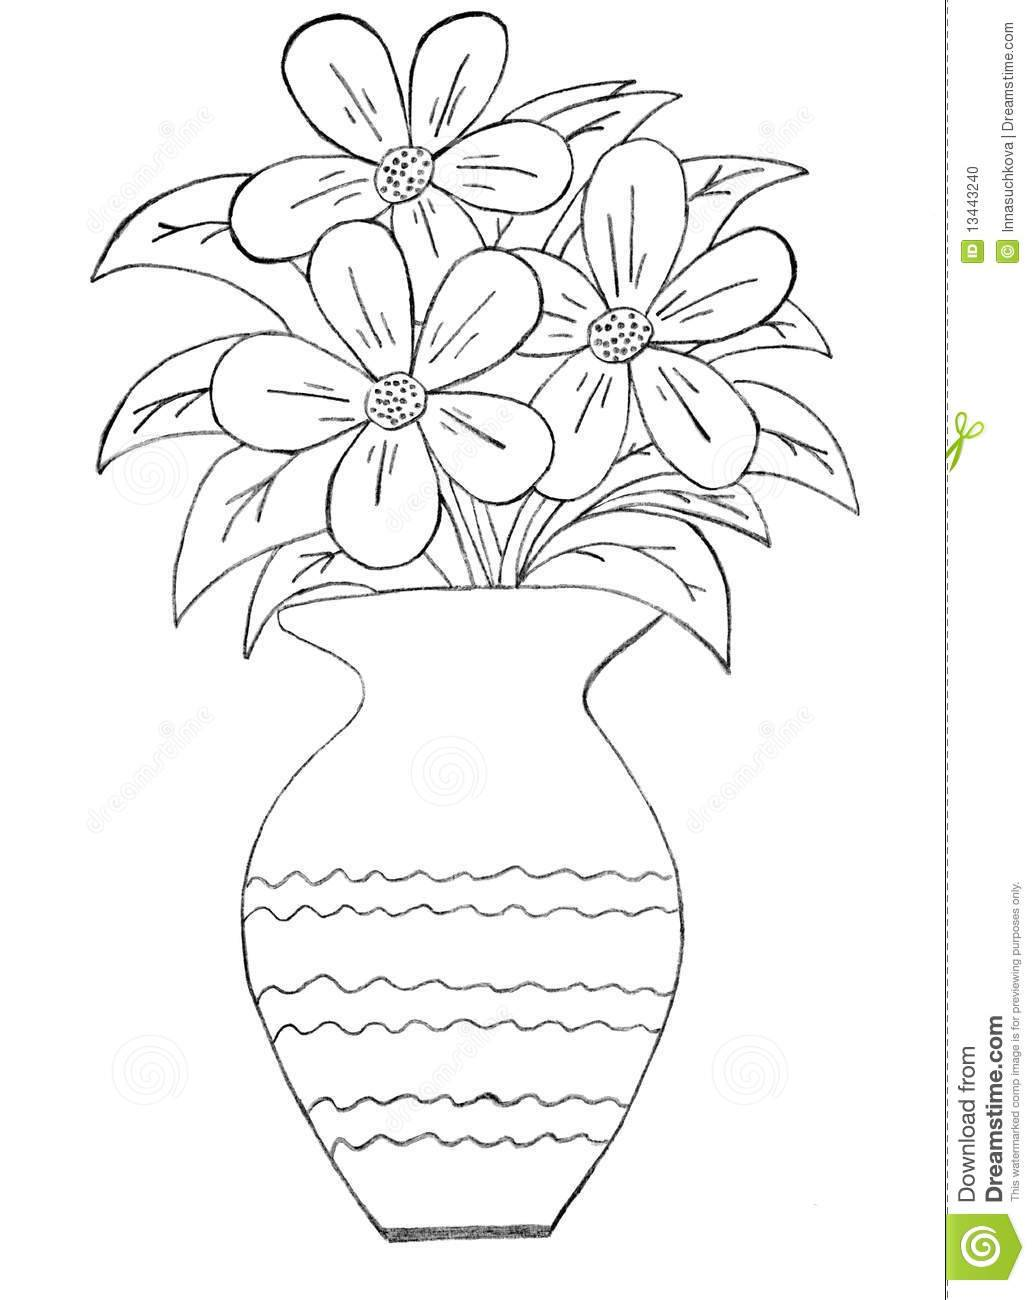 Drawn vase Vase And Download Vase Drawing